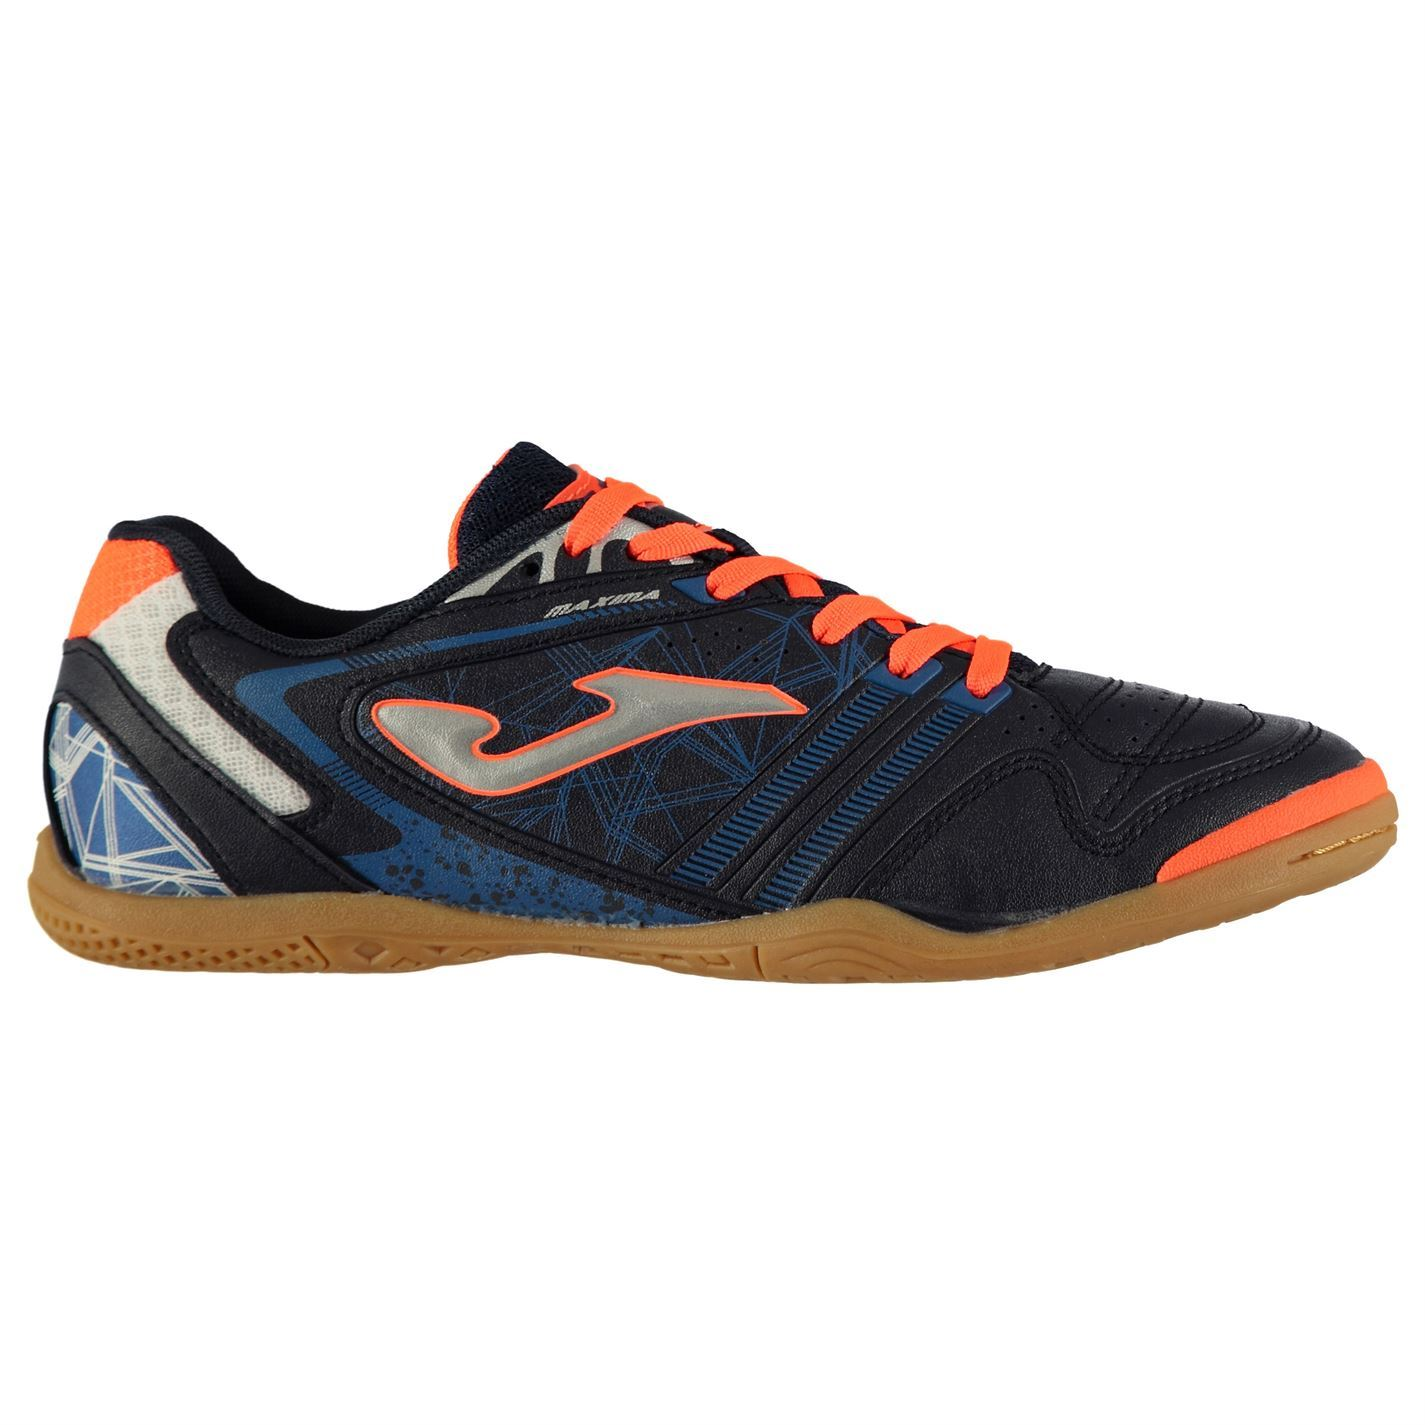 3ee043a52ed7f Joma Maxima Indoor Football Trainers Mens Soccer Futsal Shoes ...